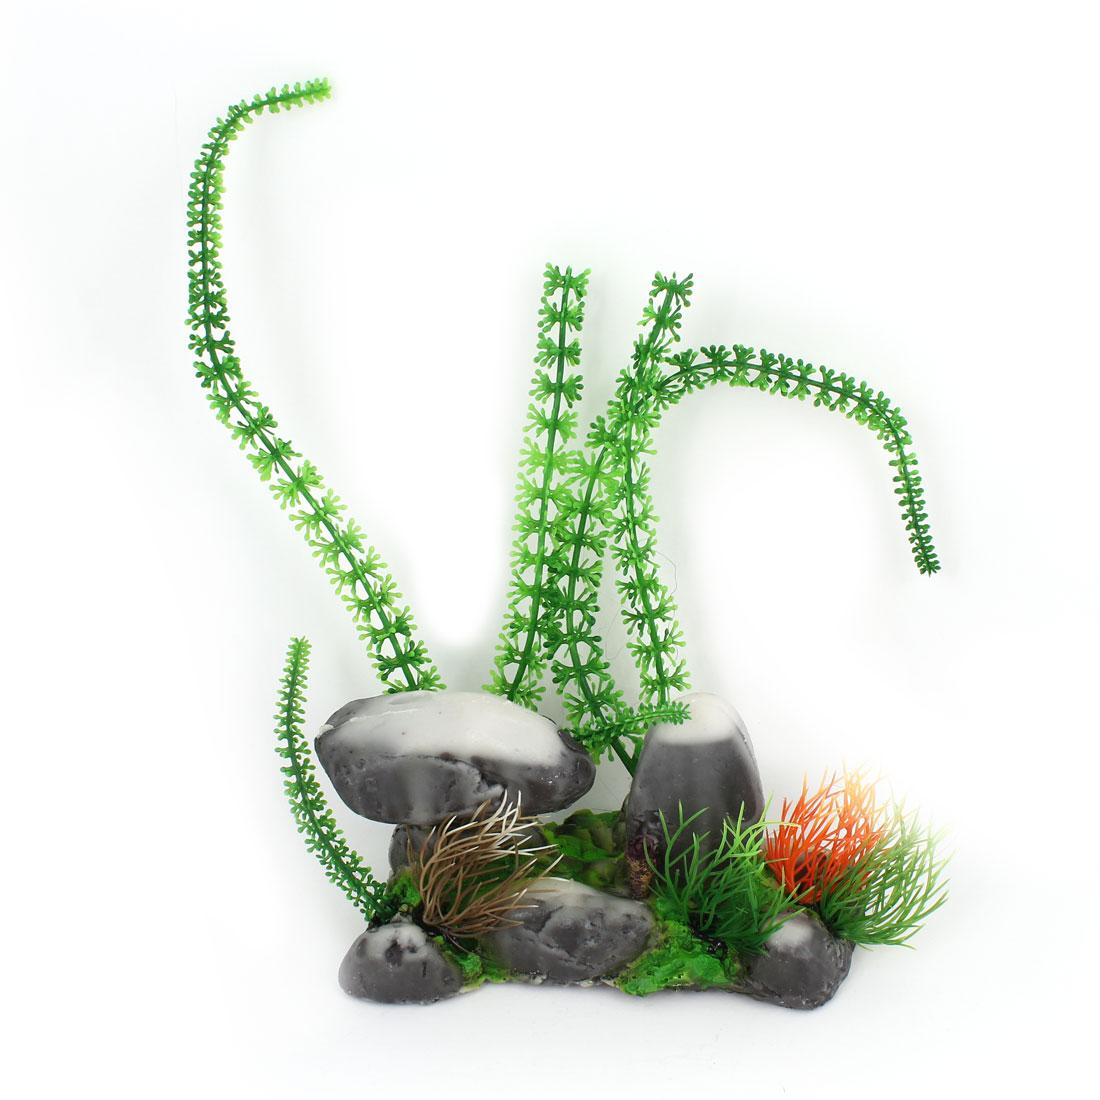 Aquarium Ornament Simulation Artificial Underwater Plant Rockery Green Gray